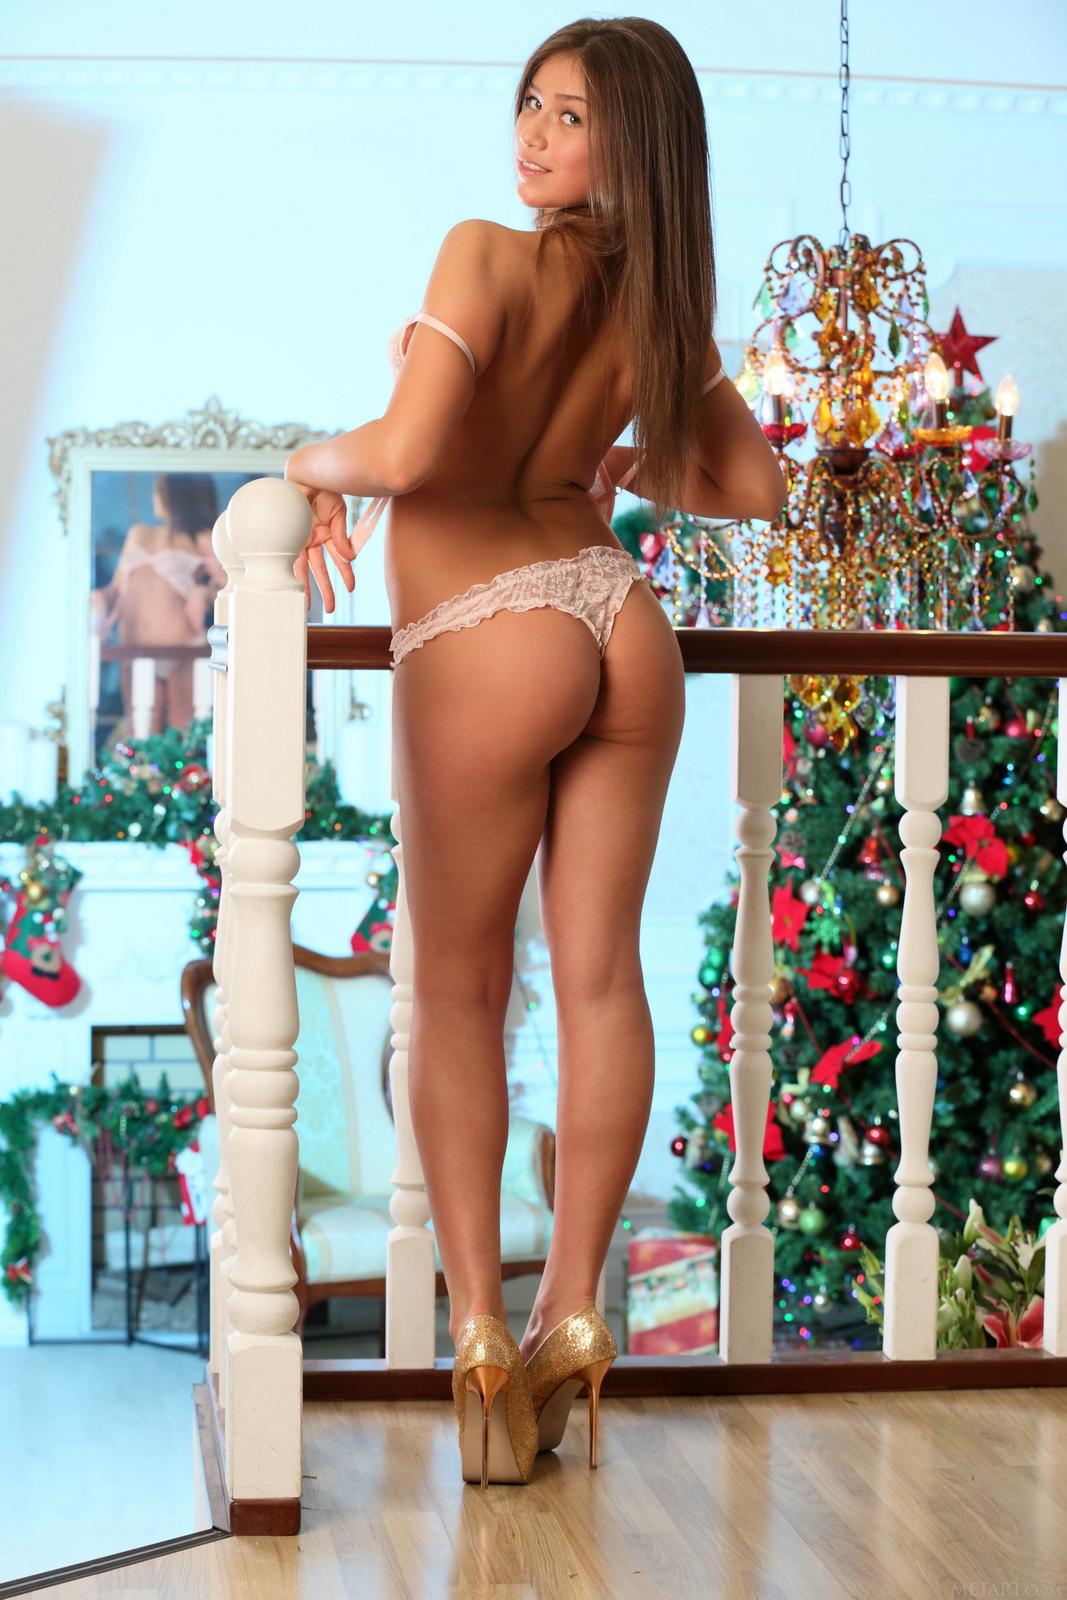 foxy-salt-lingerie-high-heels-nude-girl-xmas-metart-04